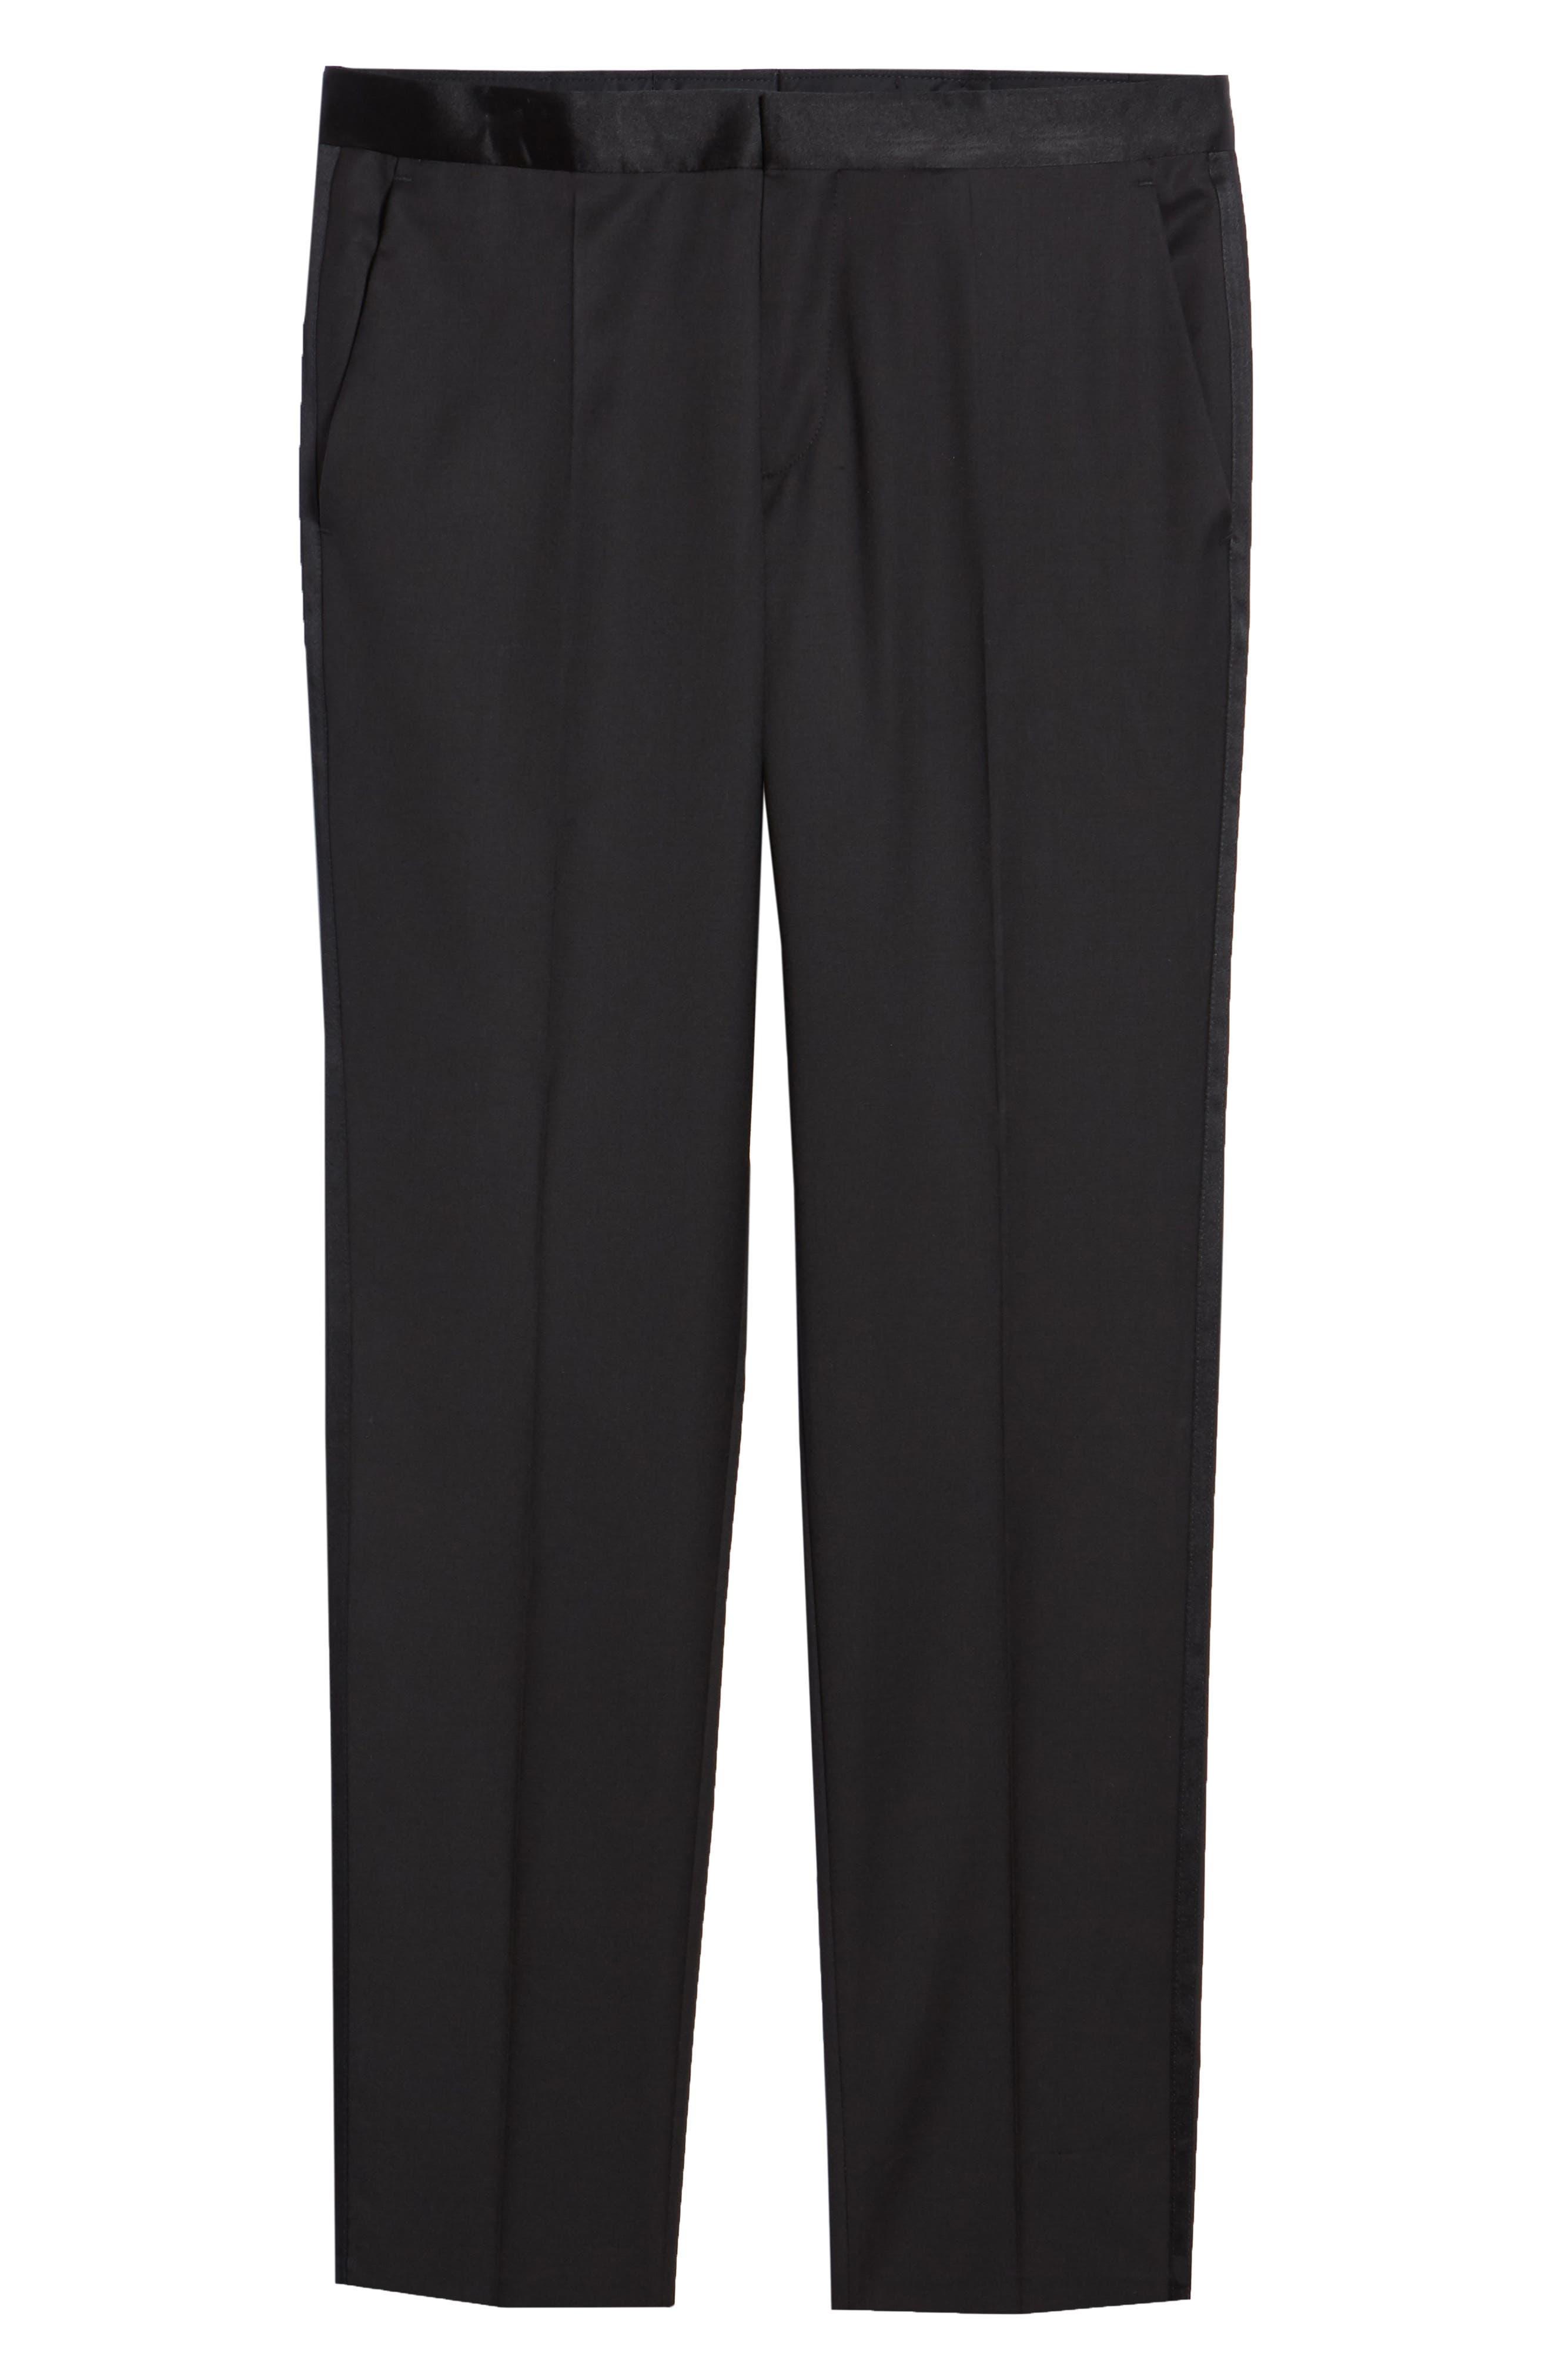 TED BAKER LONDON, Josh Flat Front Wool & Mohair Tuxedo Pants, Alternate thumbnail 6, color, BLACK